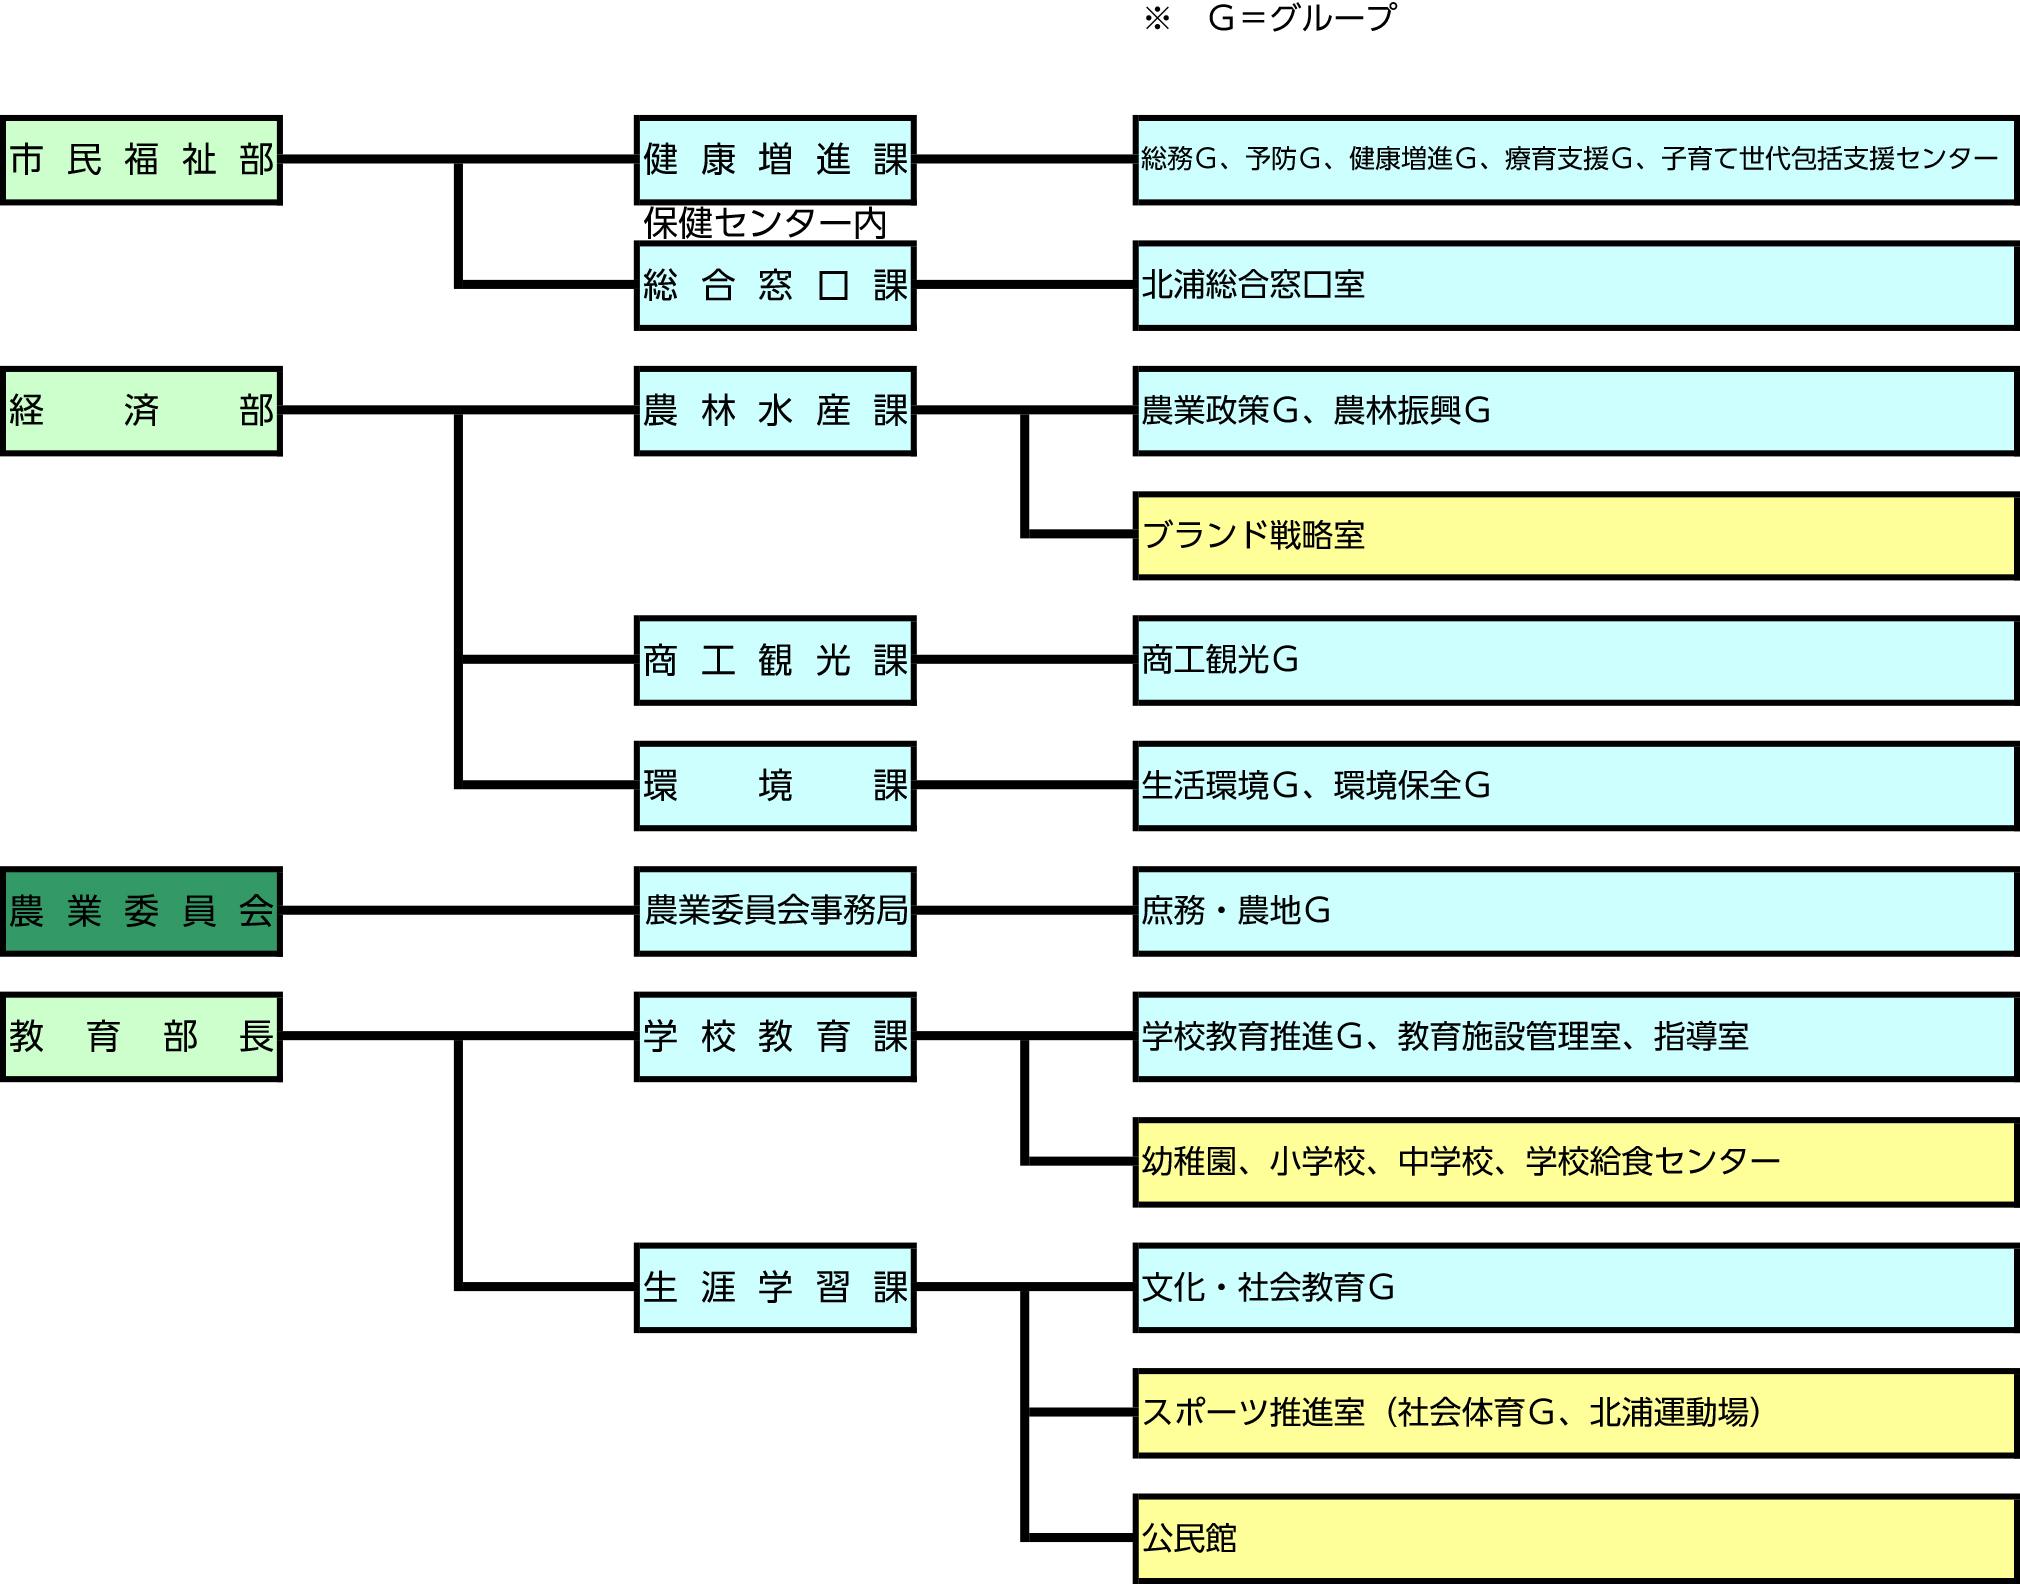 『R02北浦組織図(HP掲載用)★』の画像